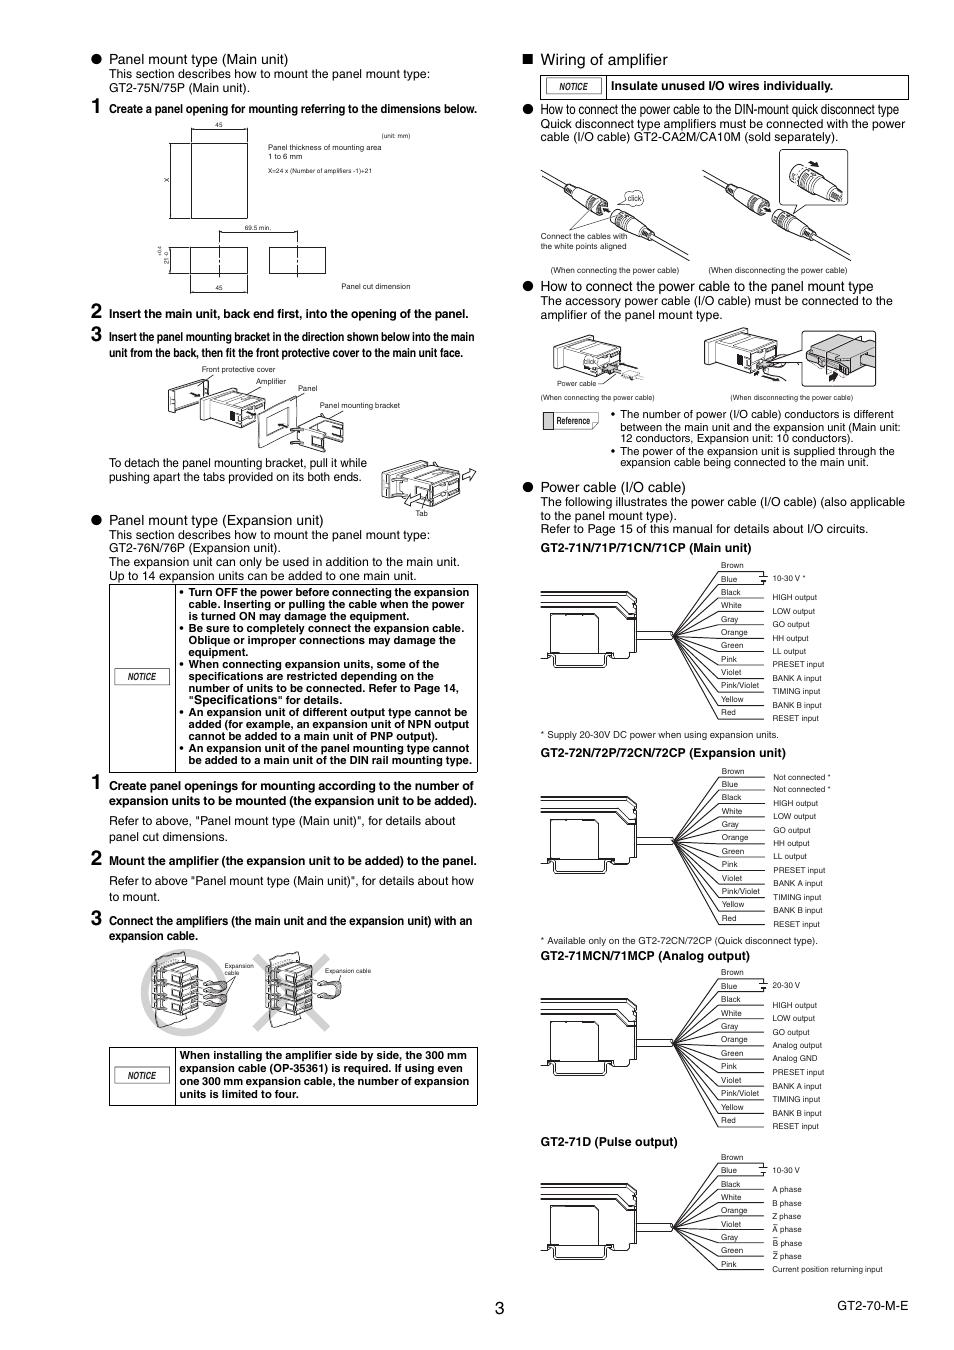 wiring of amplifier panel mount type main unit panel mount type rh manualsdir com